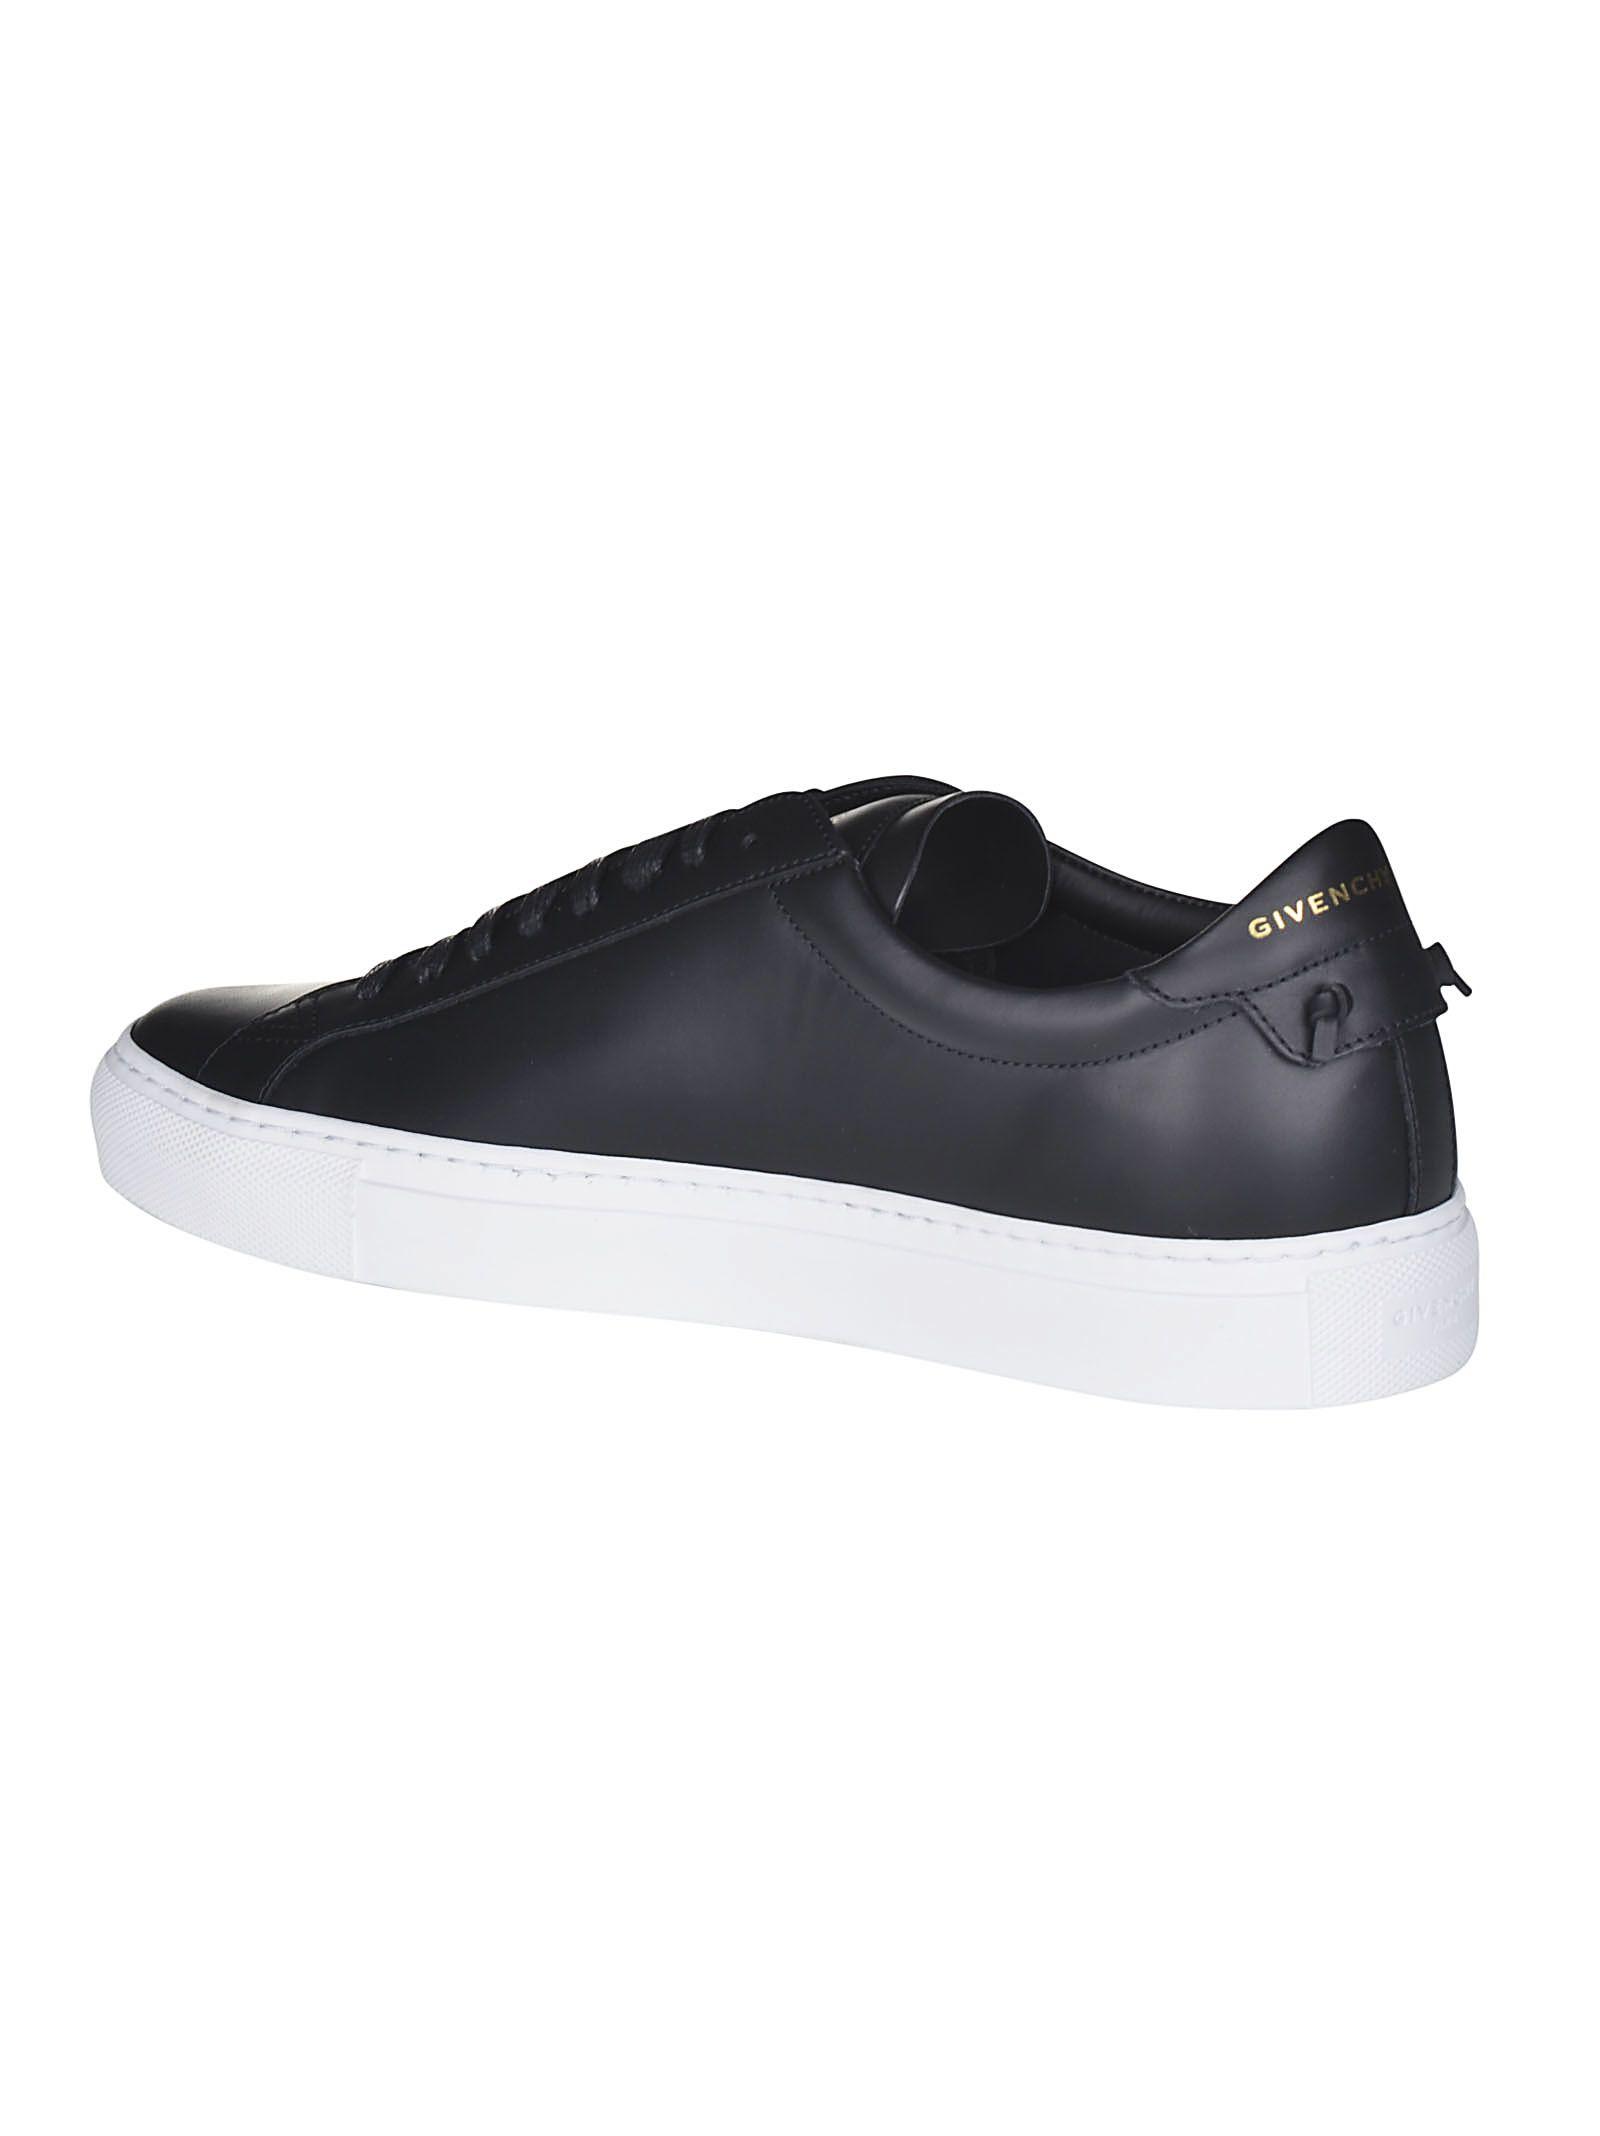 bd19f39f86a 10691874 Street Italist Black Sneakers Urban Givenchy qnIxUw